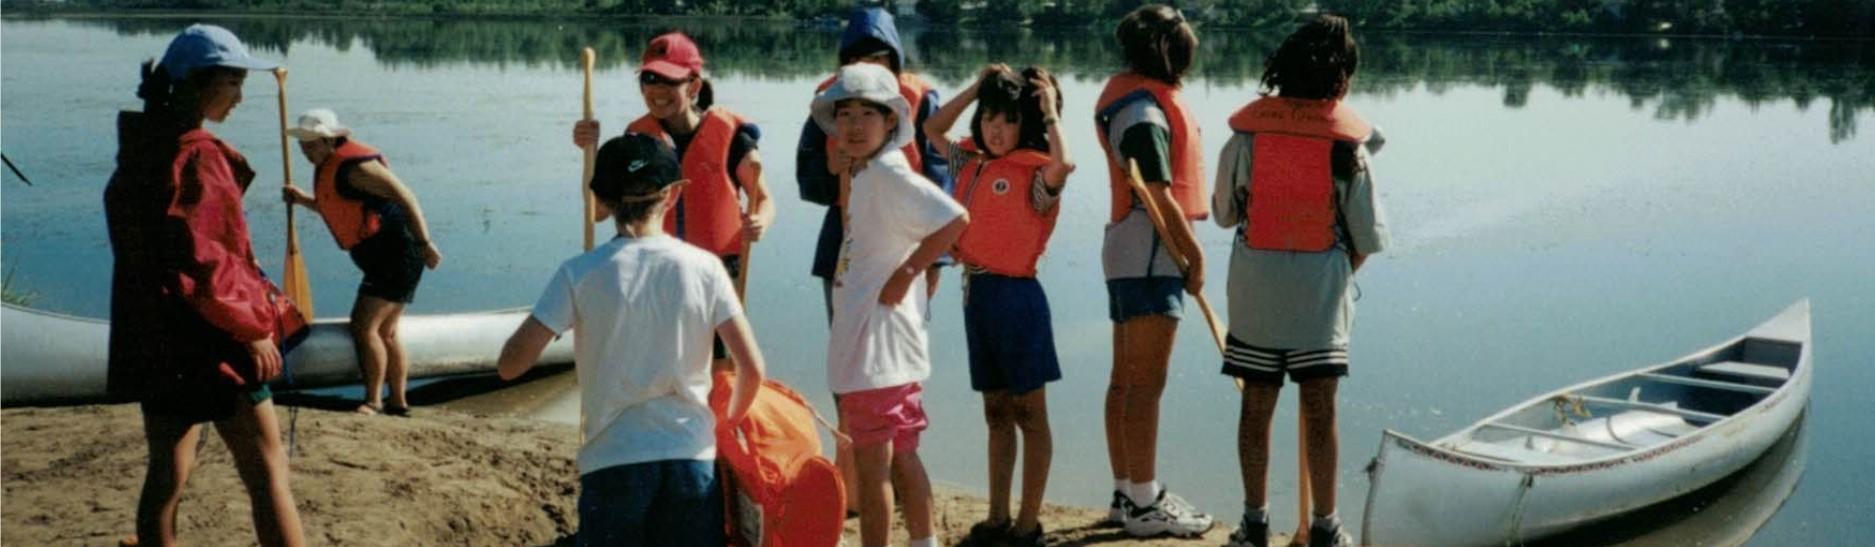 IWS_International Women of Saskatoon_history- 2